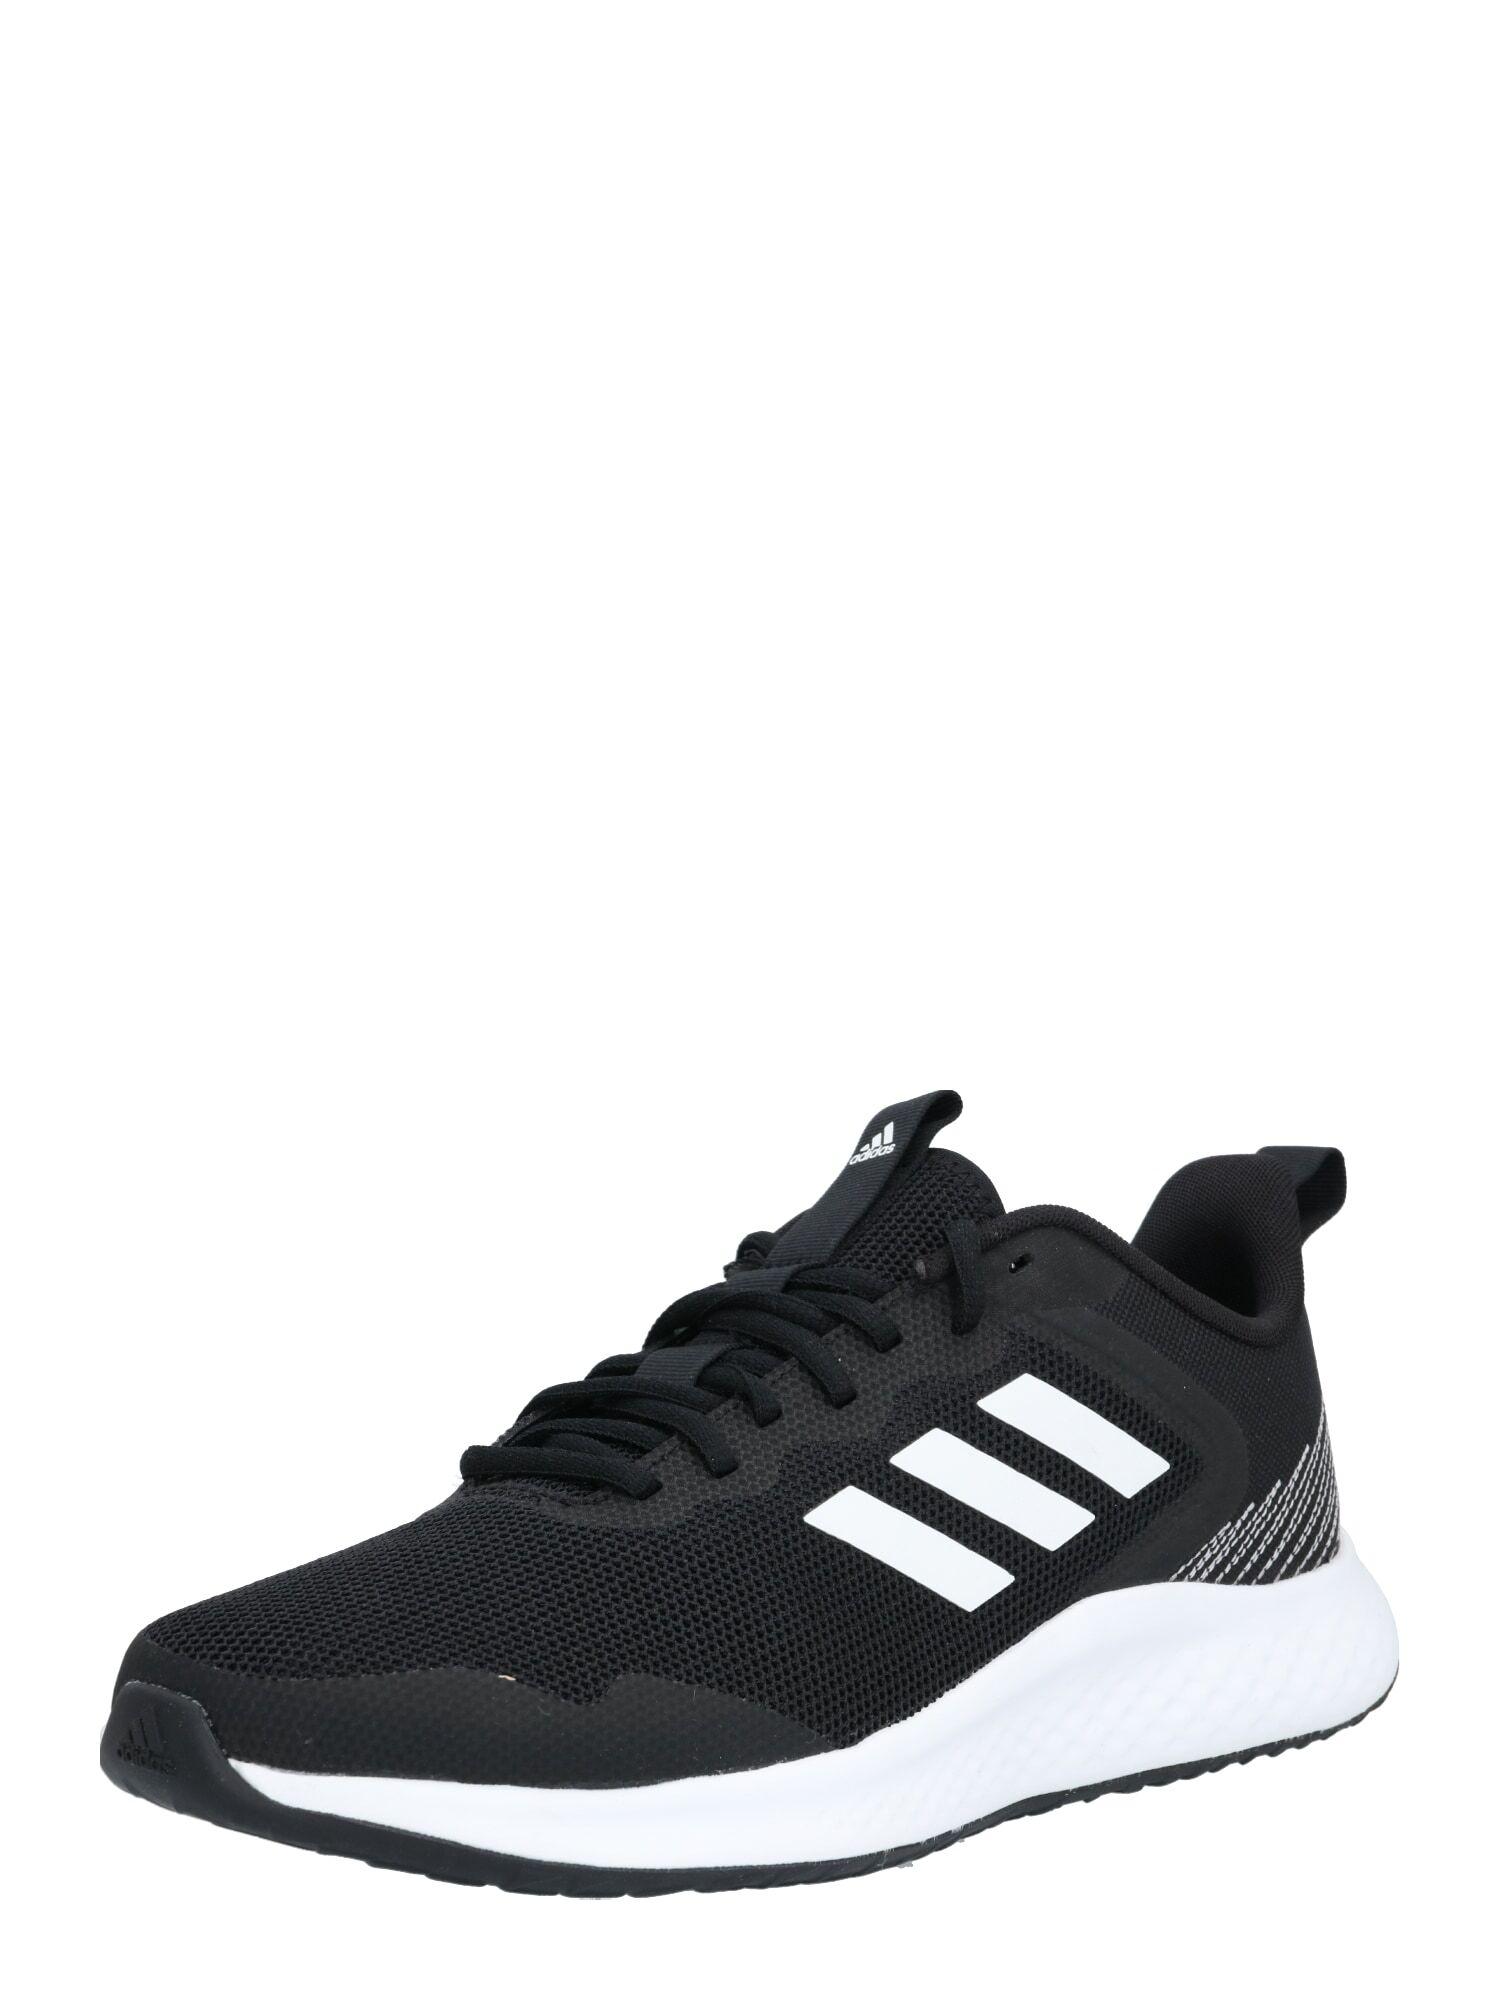 ADIDAS PERFORMANCE Chaussure de course 'Fluid Street'  - Noir - Taille: 10.5 - male